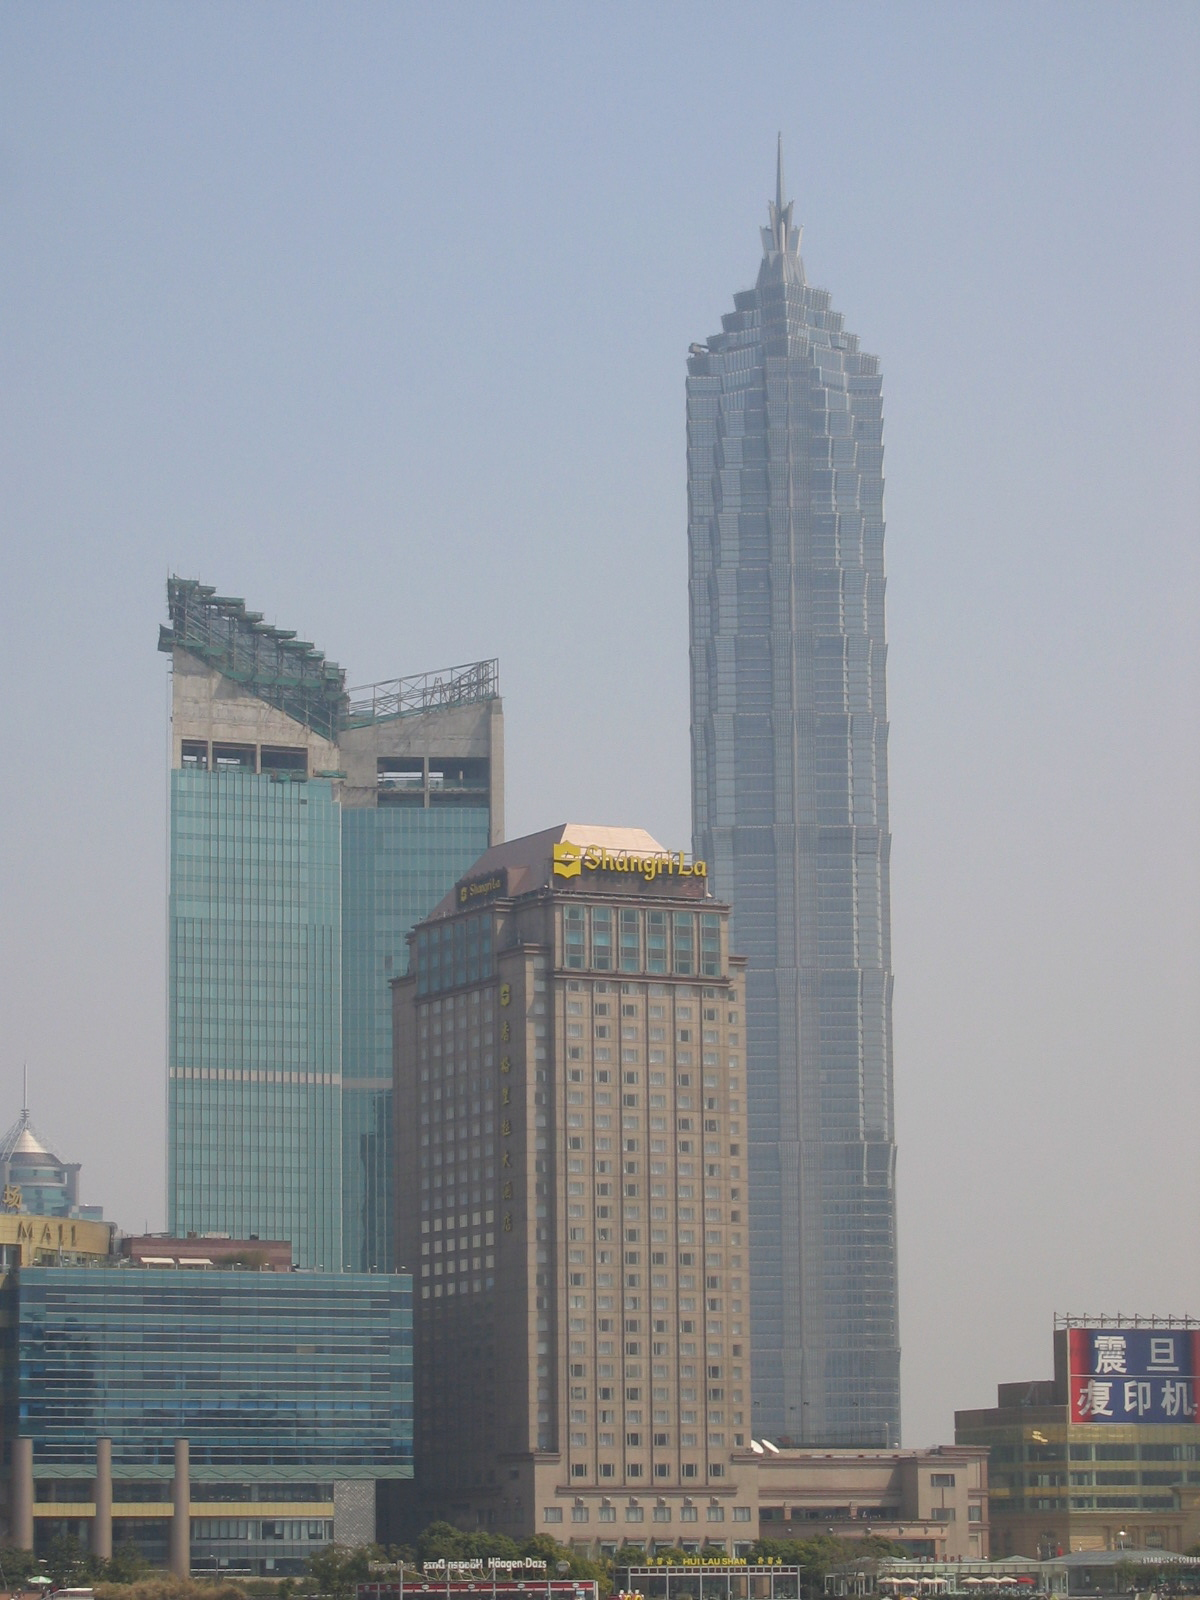 RnL: Jin Mao Tower, Shangri-La Hotel, Super Brand Mall, die Baustelle ist der Shangri-La Anbau